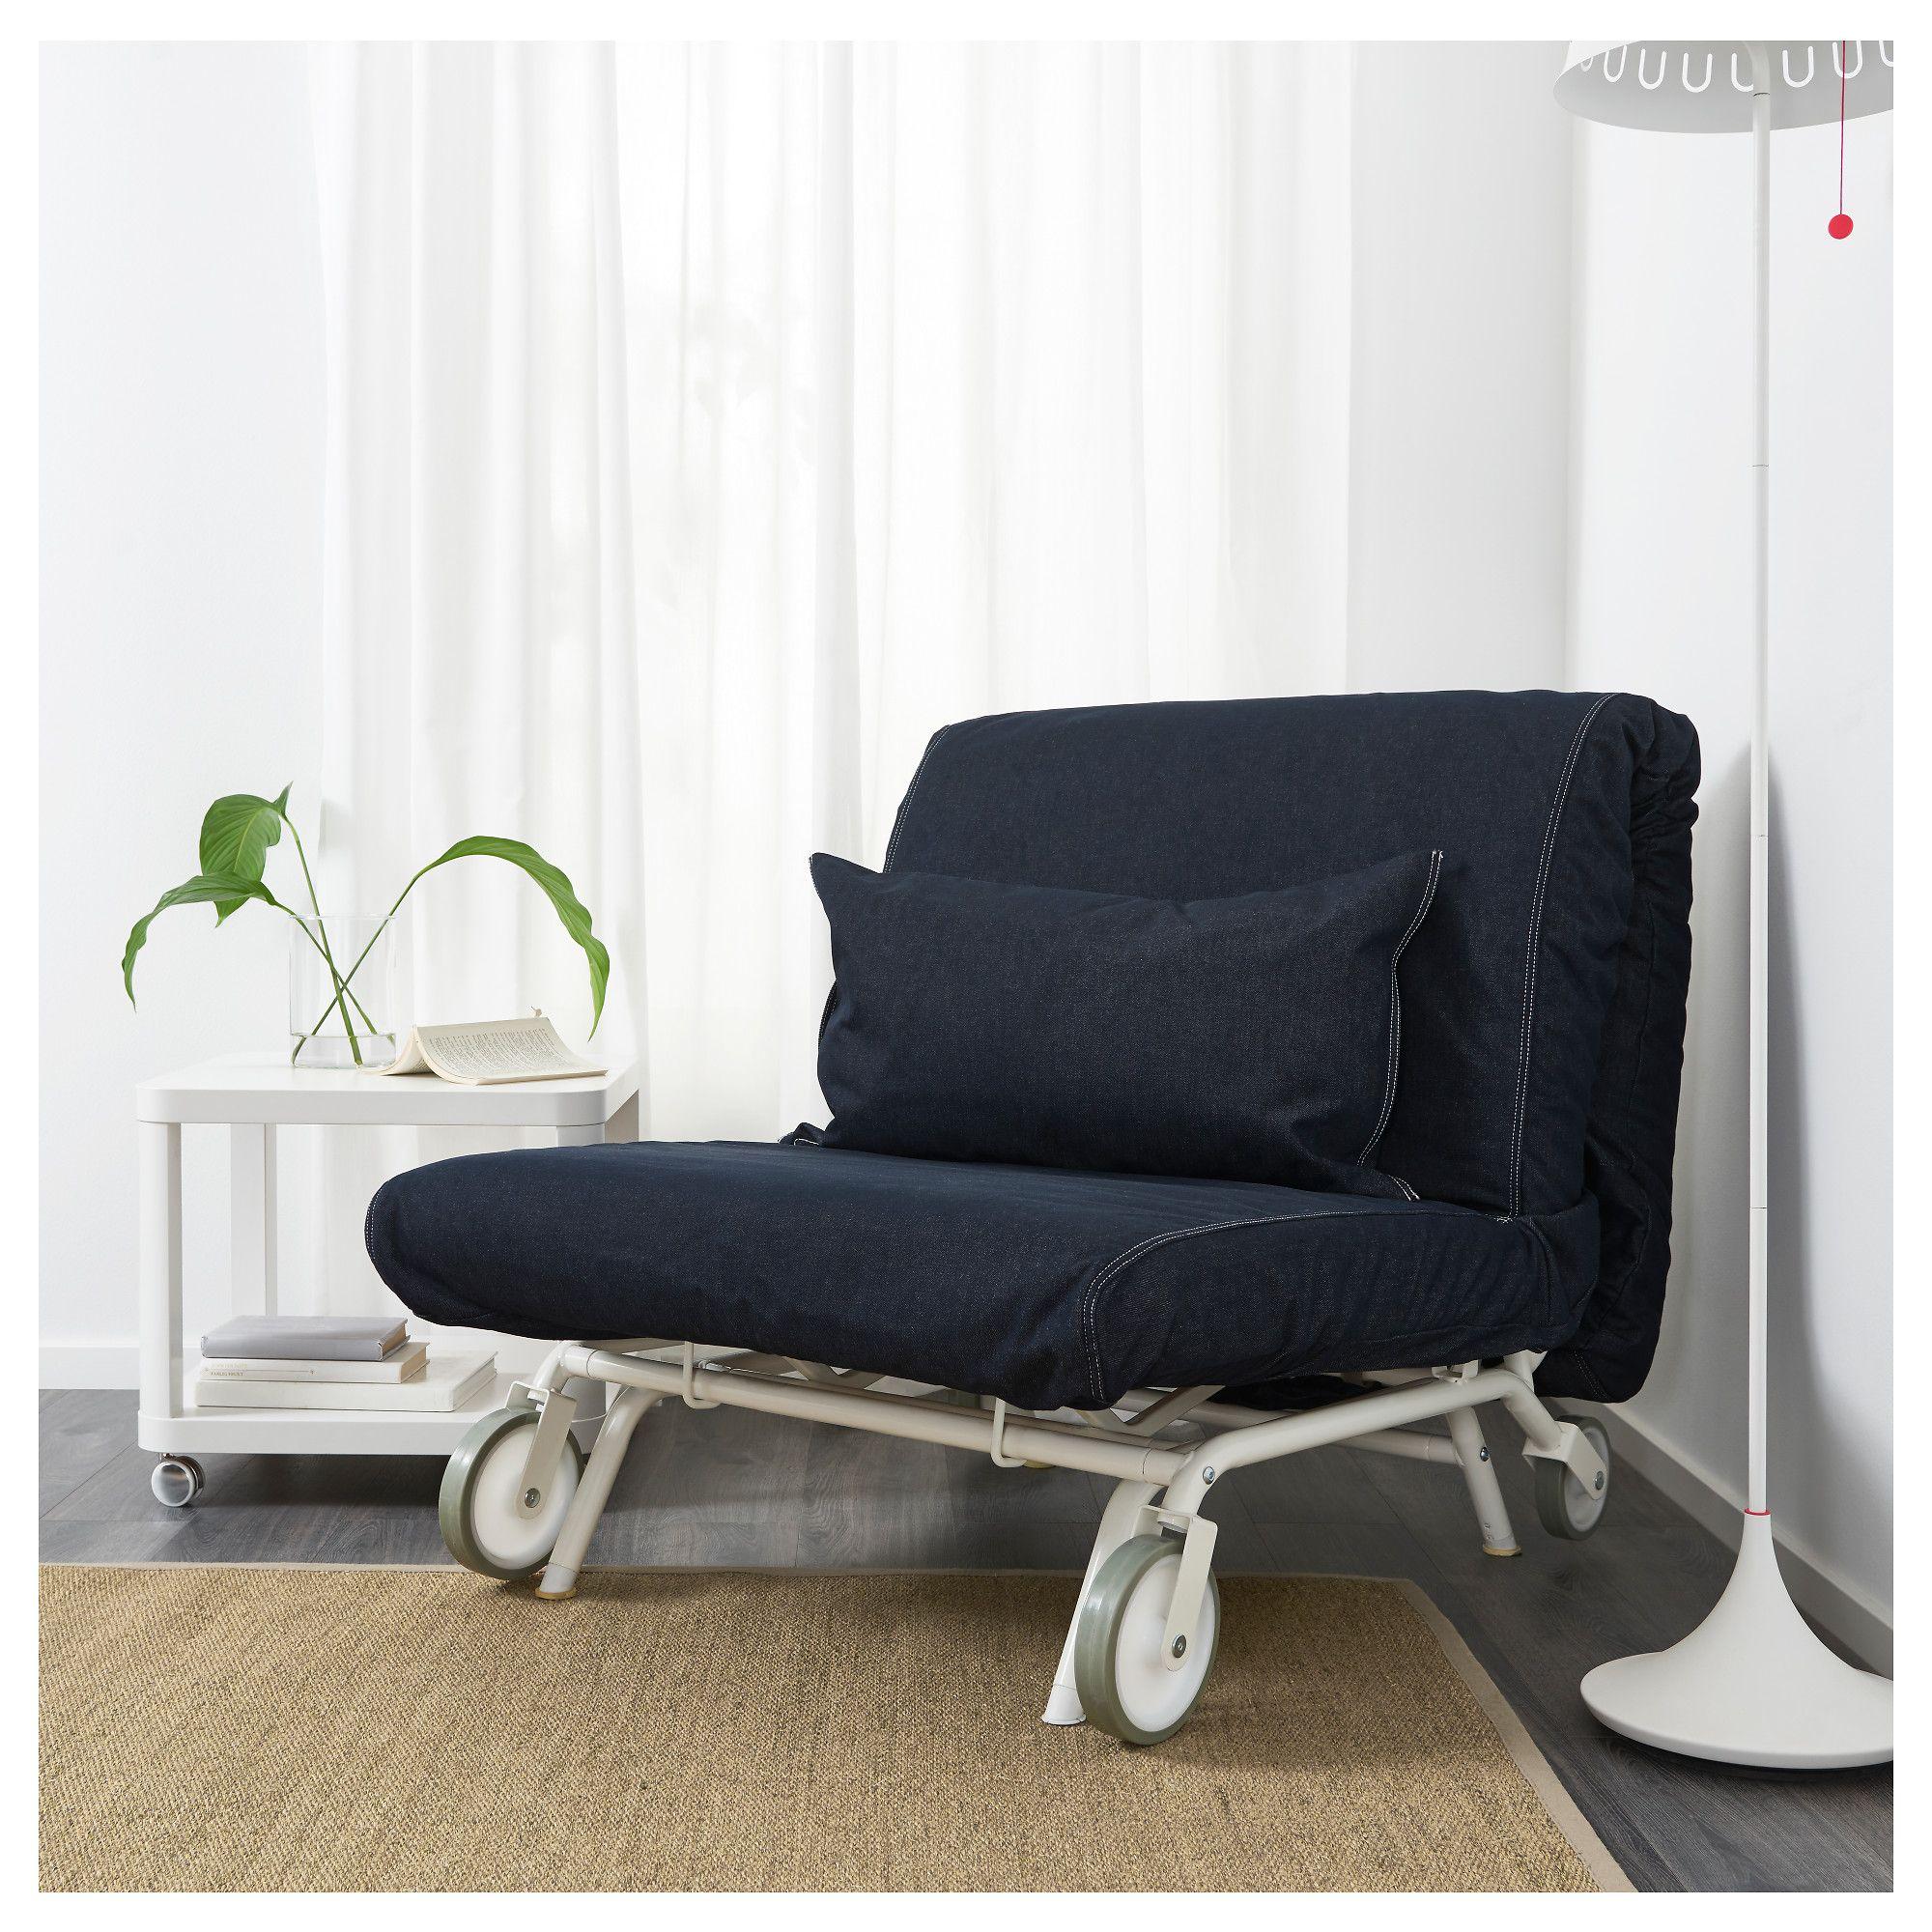 Sofas Center Sofa Beds Cheap Bedding Ara Futon With Storage Full